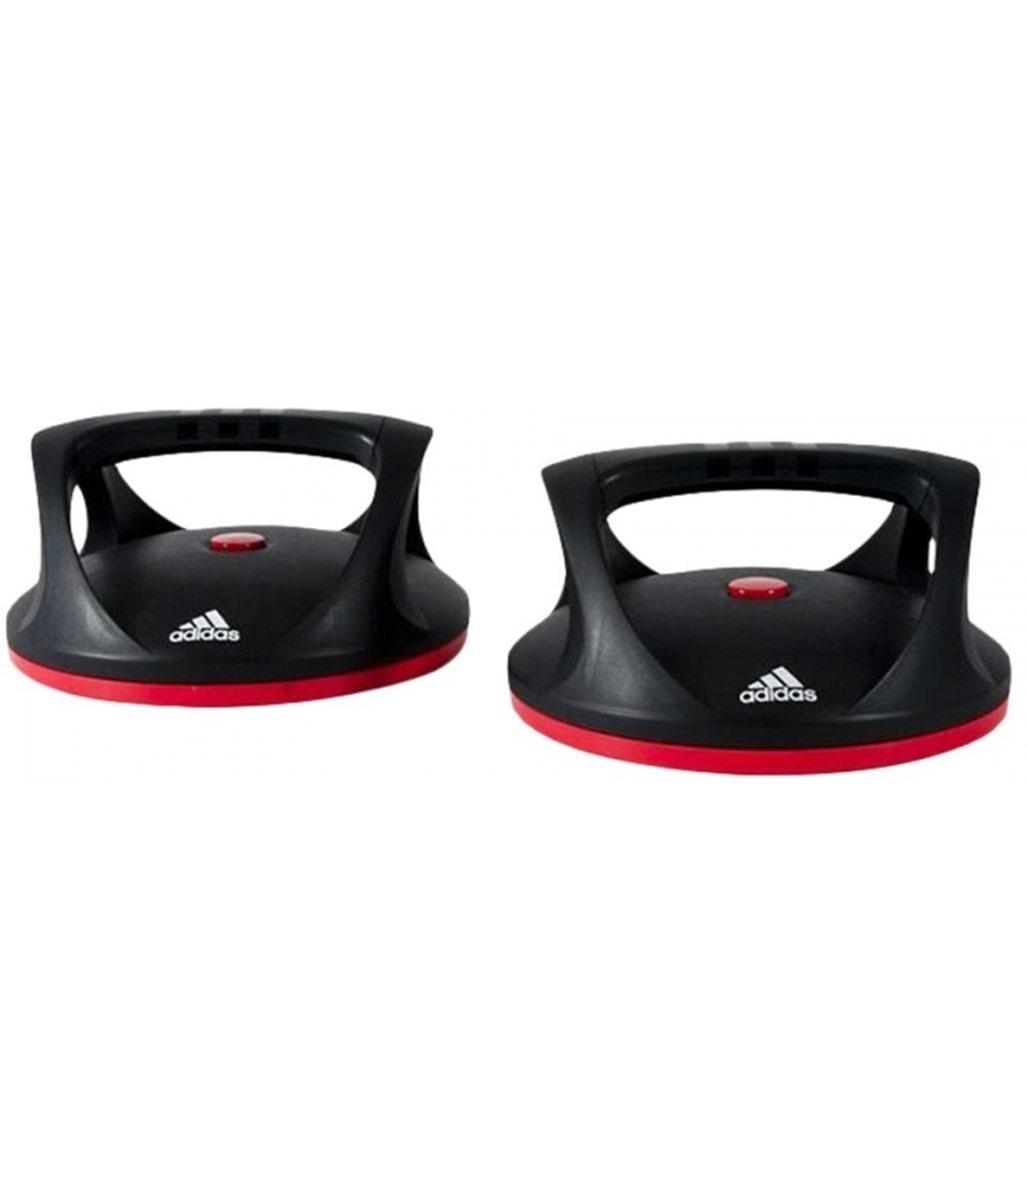 Adidas Swivel Push Up Bars